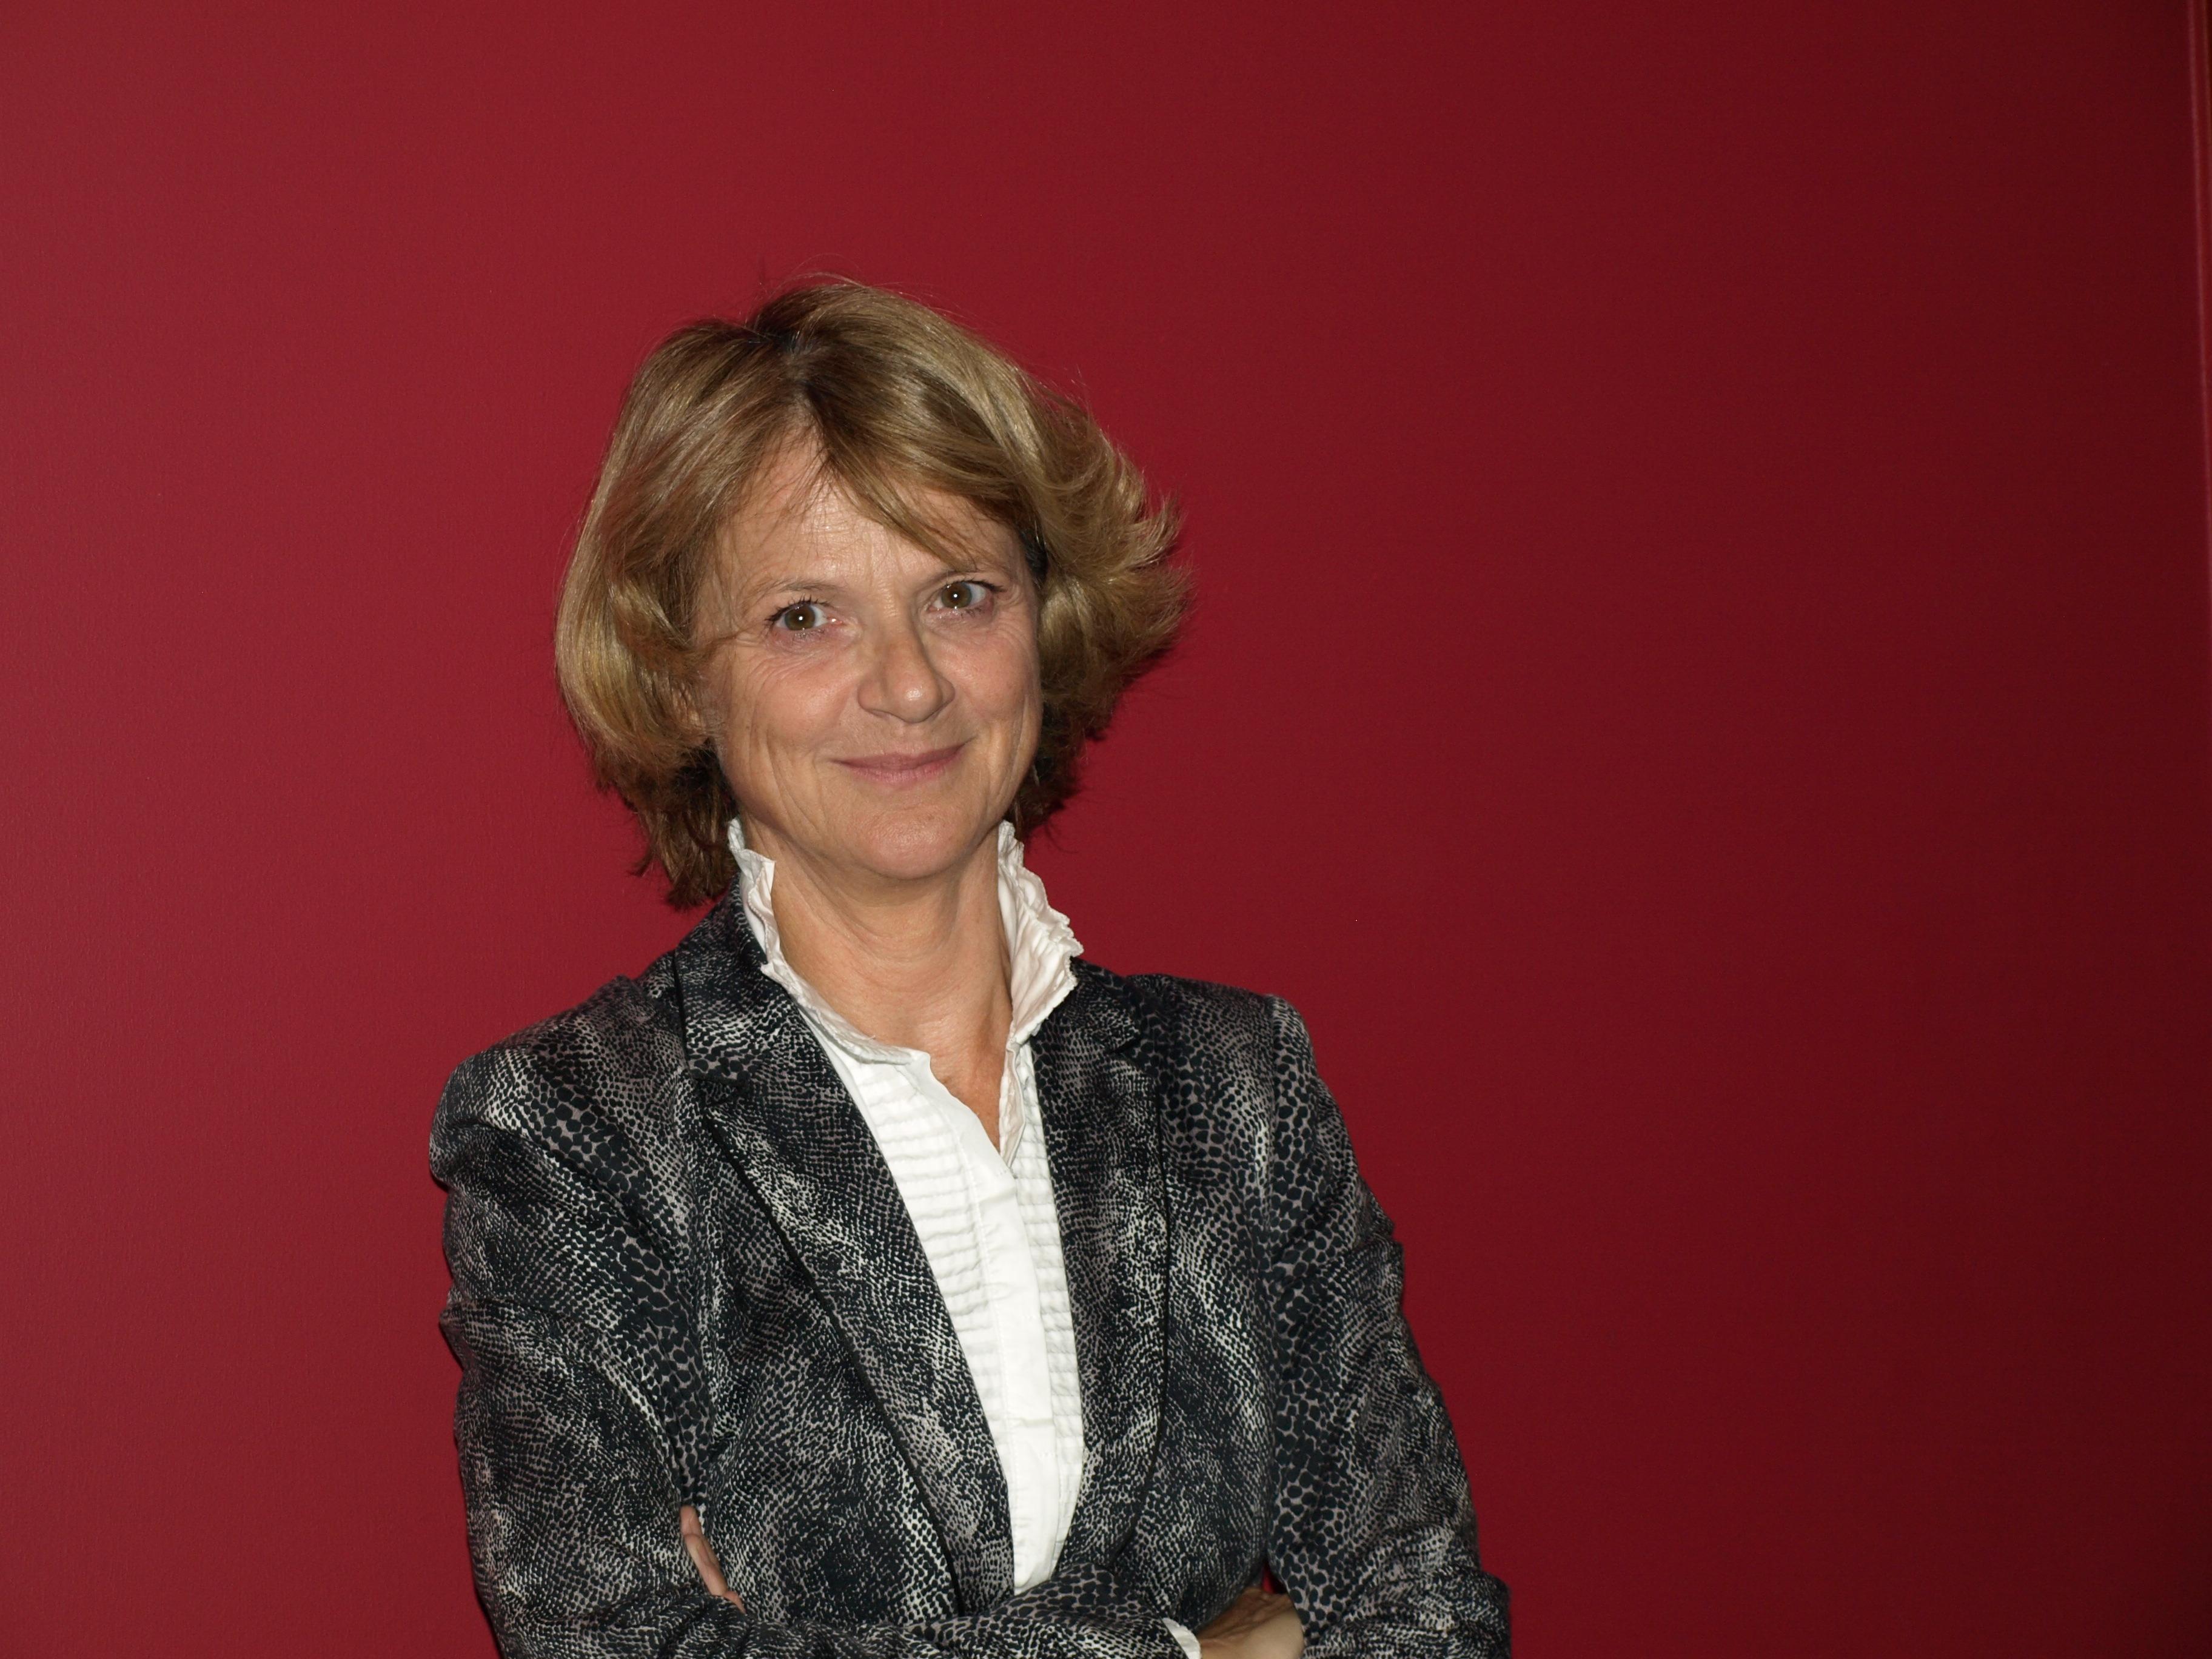 Tatjana Medvecka